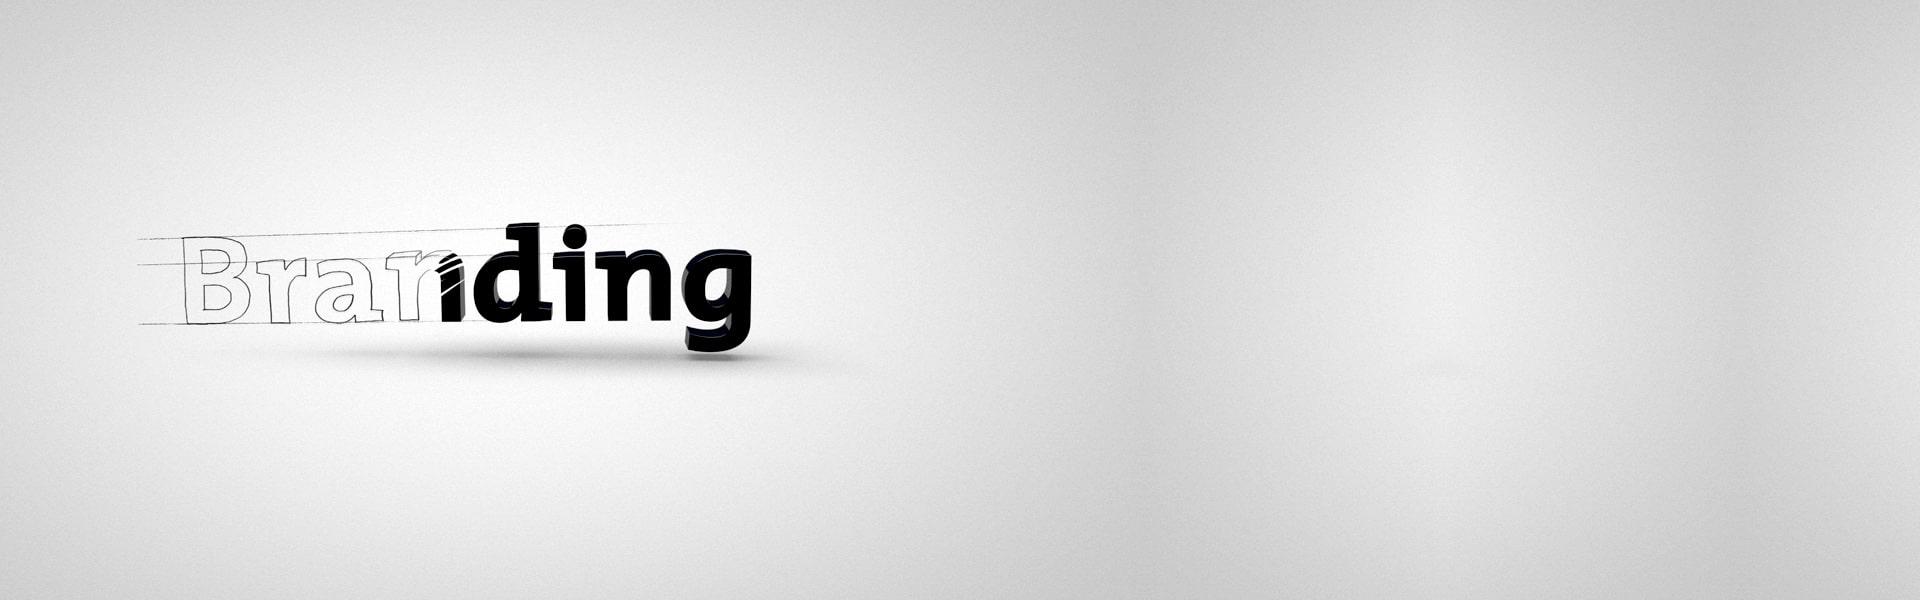 Digital Marketing Agency Burlington MA